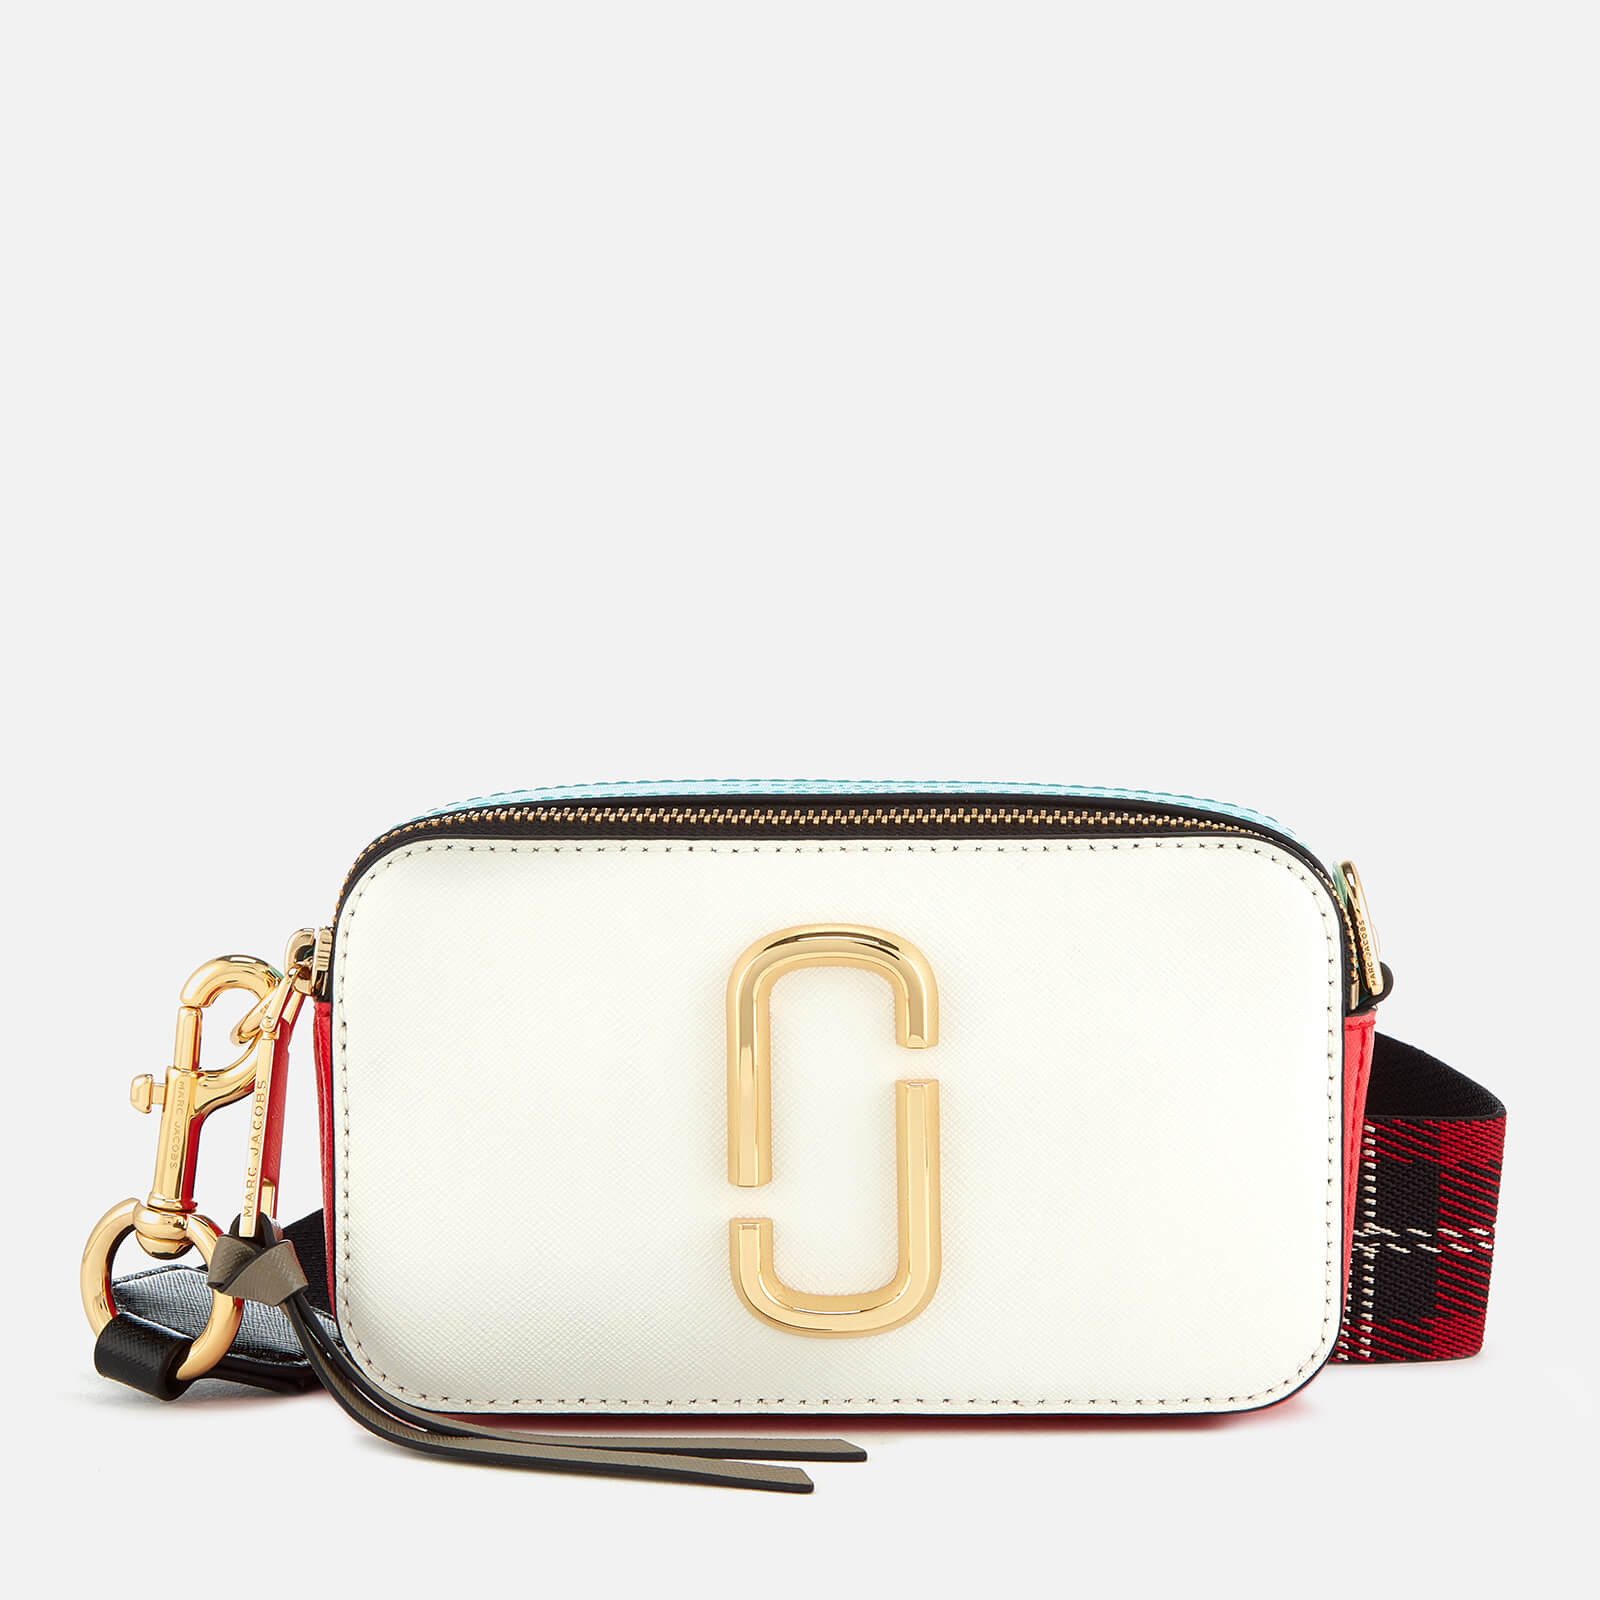 Marc Jacobs Women's Snapshot Cross Body Bag - Porcelain